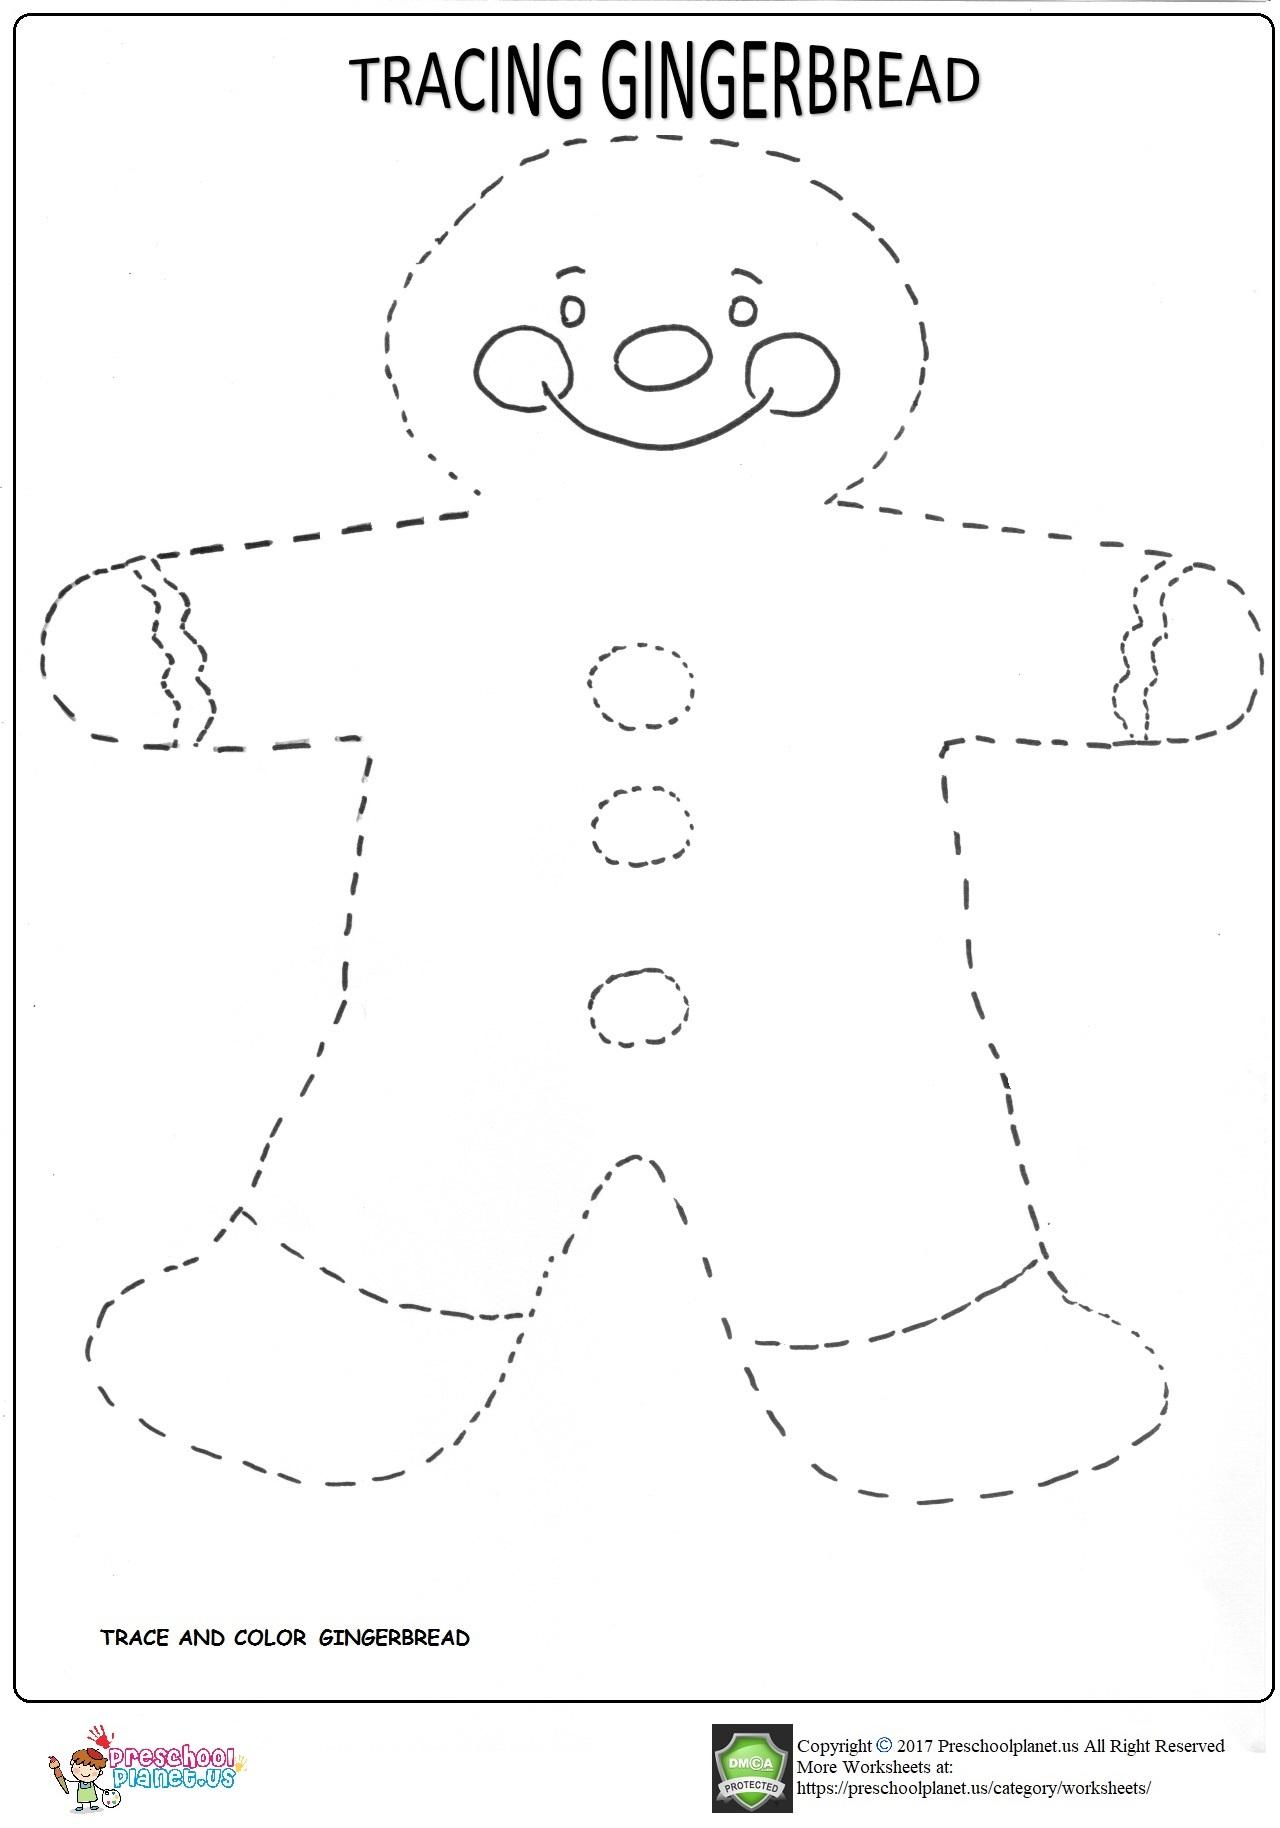 Trace Gingerbread Worksheet For Kids Preschoolplanet